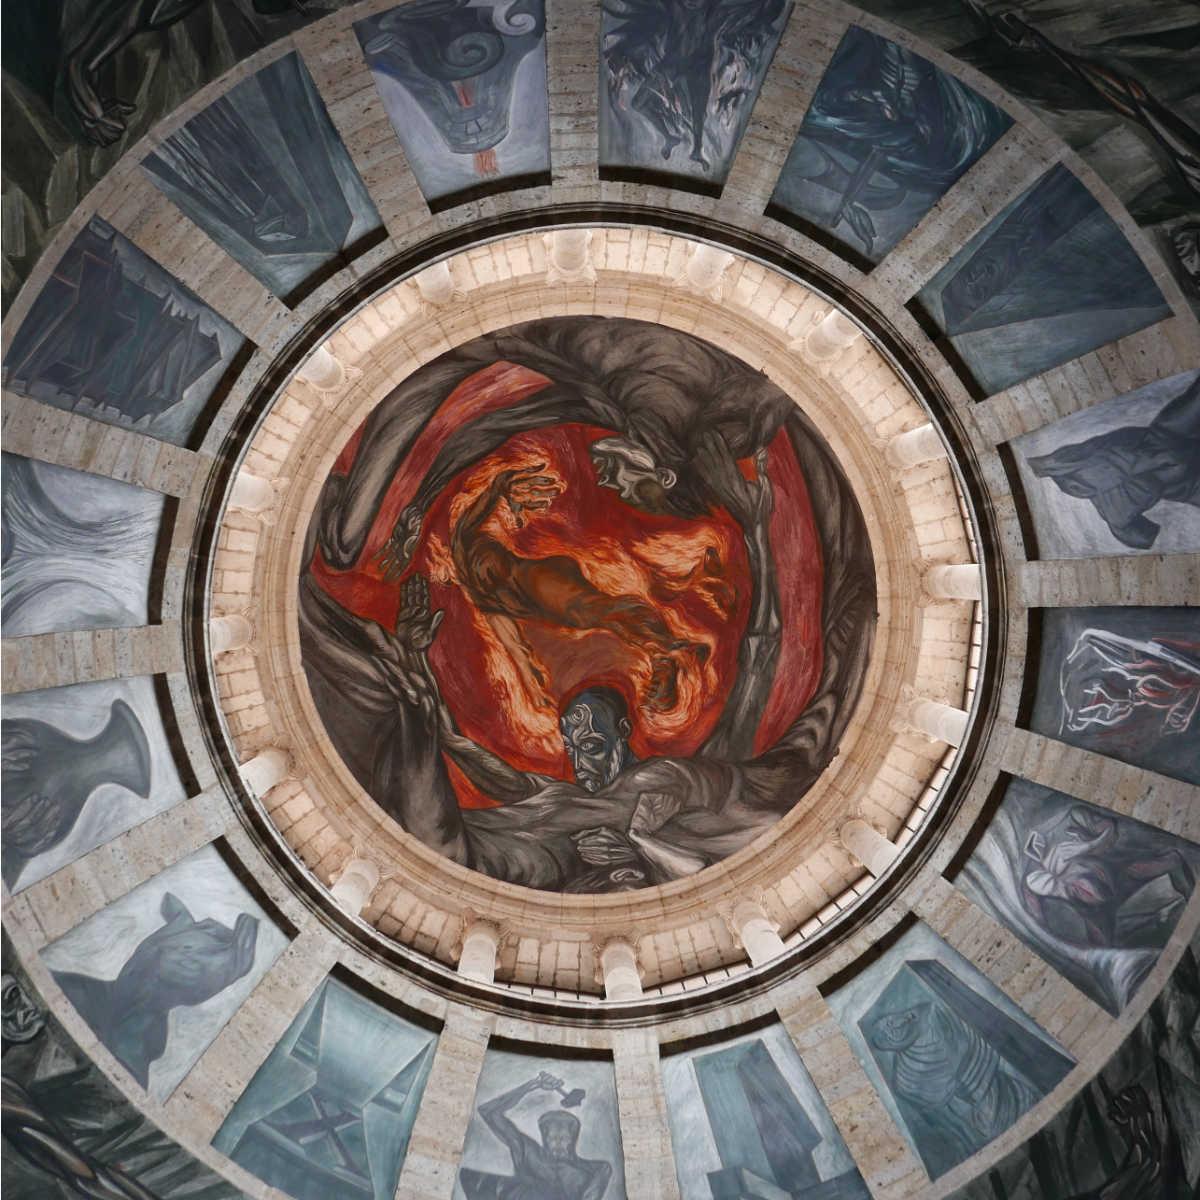 Orozco's famous Man of Fire in the dome of Hospicio Cabanas in Guadalajara